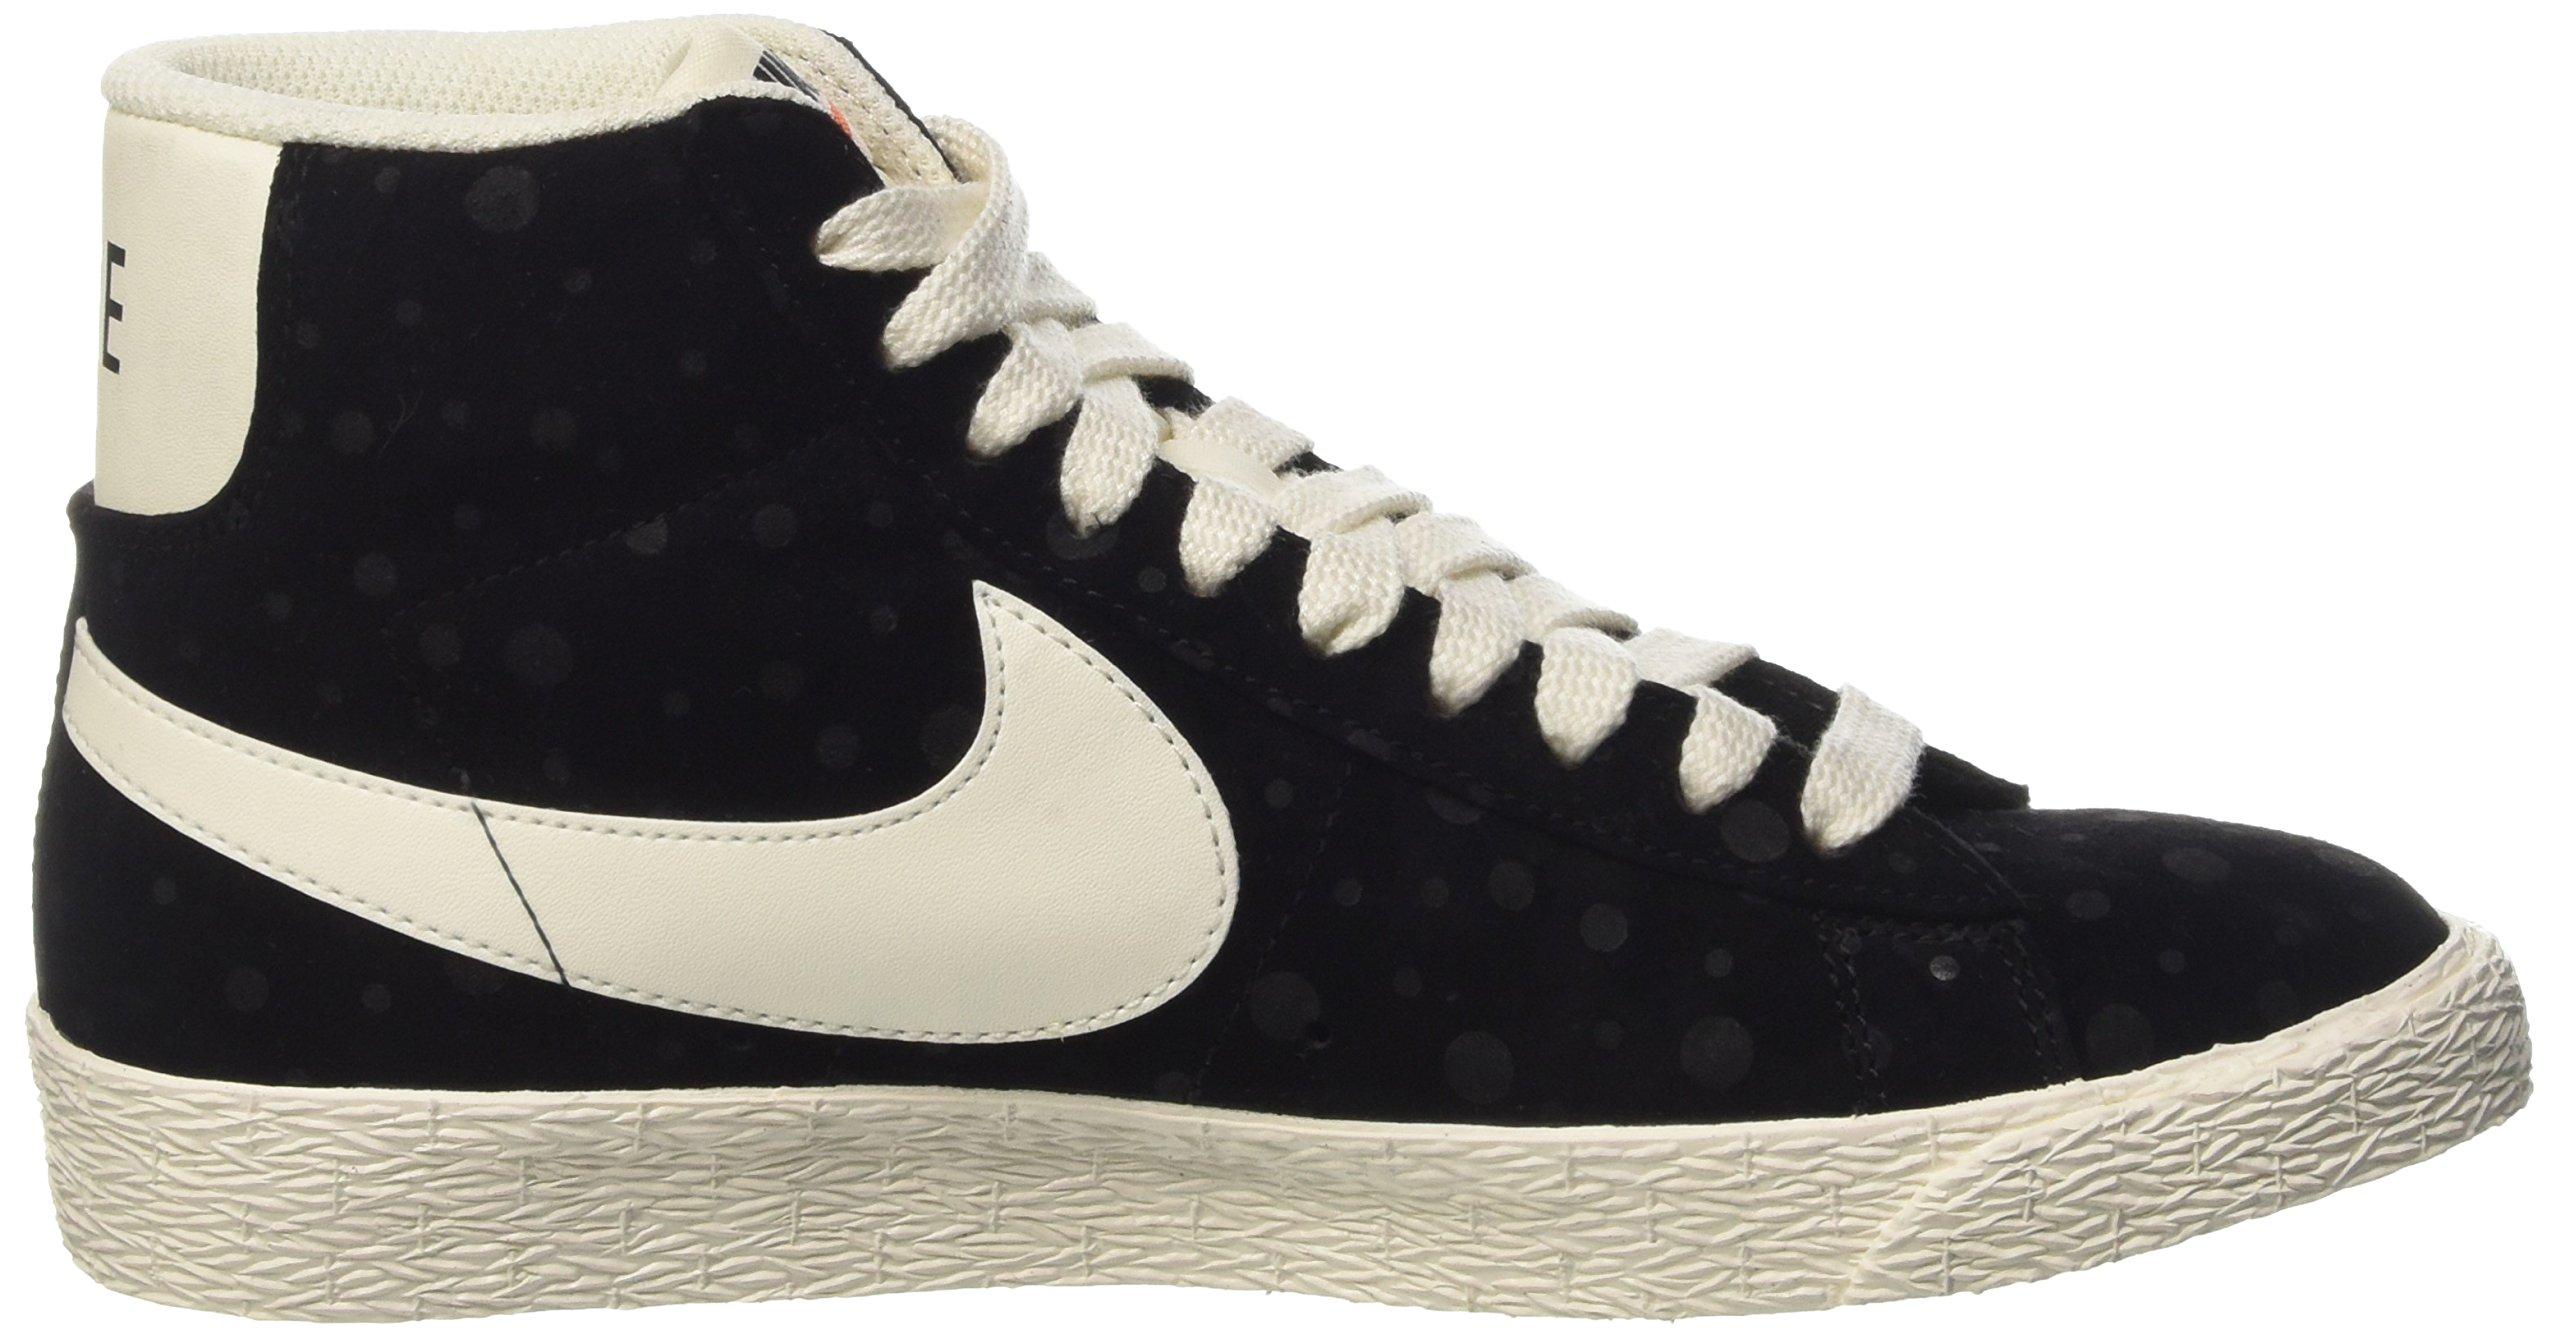 Nike Women's Blazer Mid Suede Vintage Black/White 518171-015 (SIZE: 8) by NIKE (Image #6)